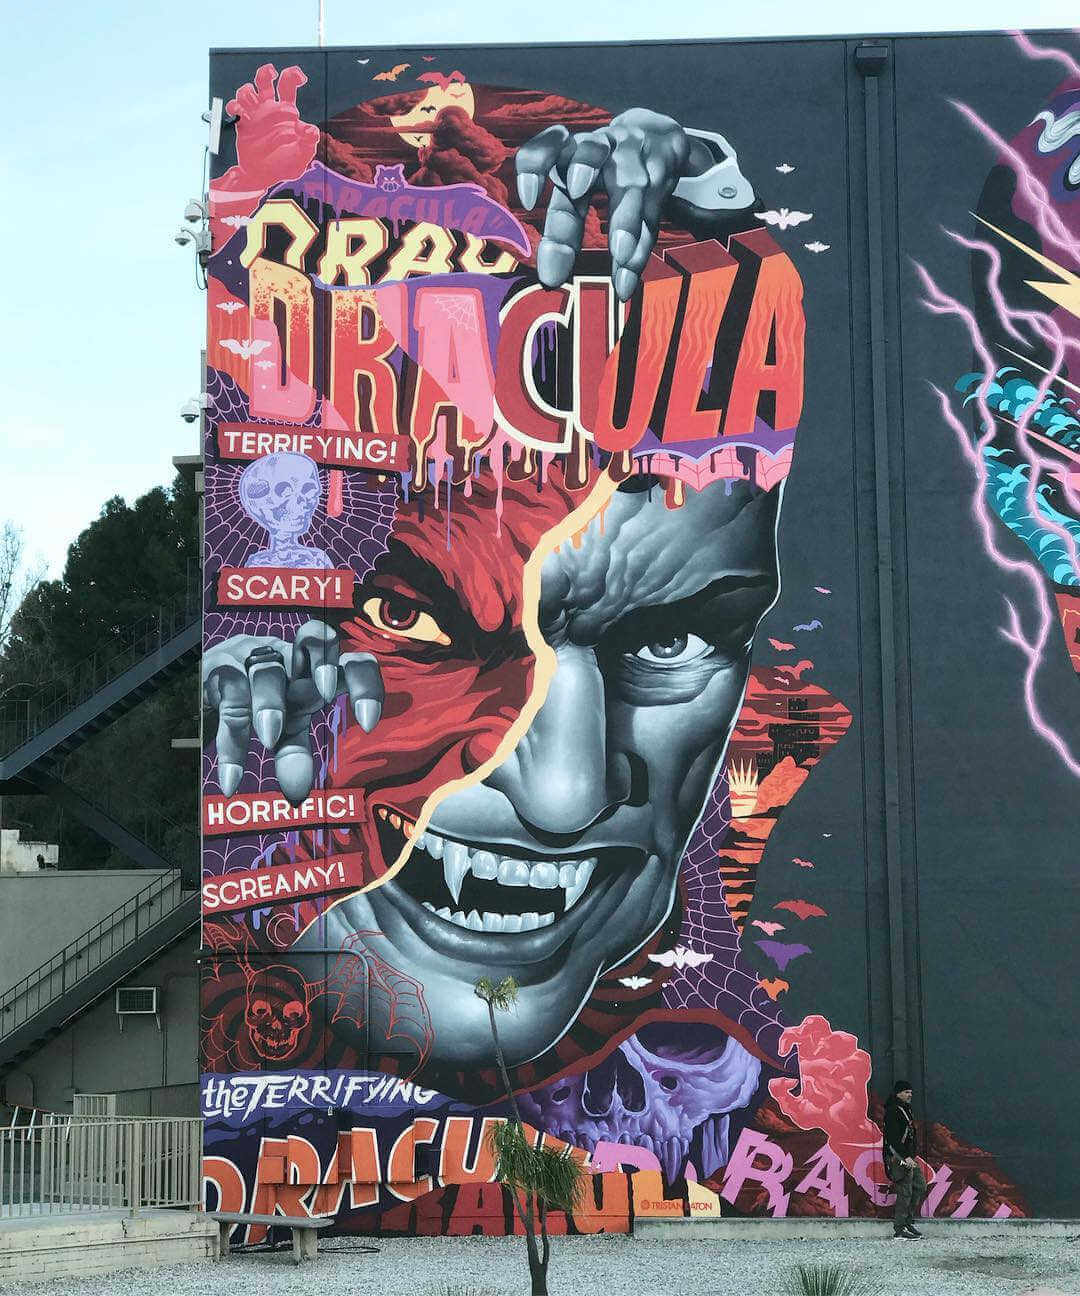 Graffiti de dracula pintado por Tristan Eaton